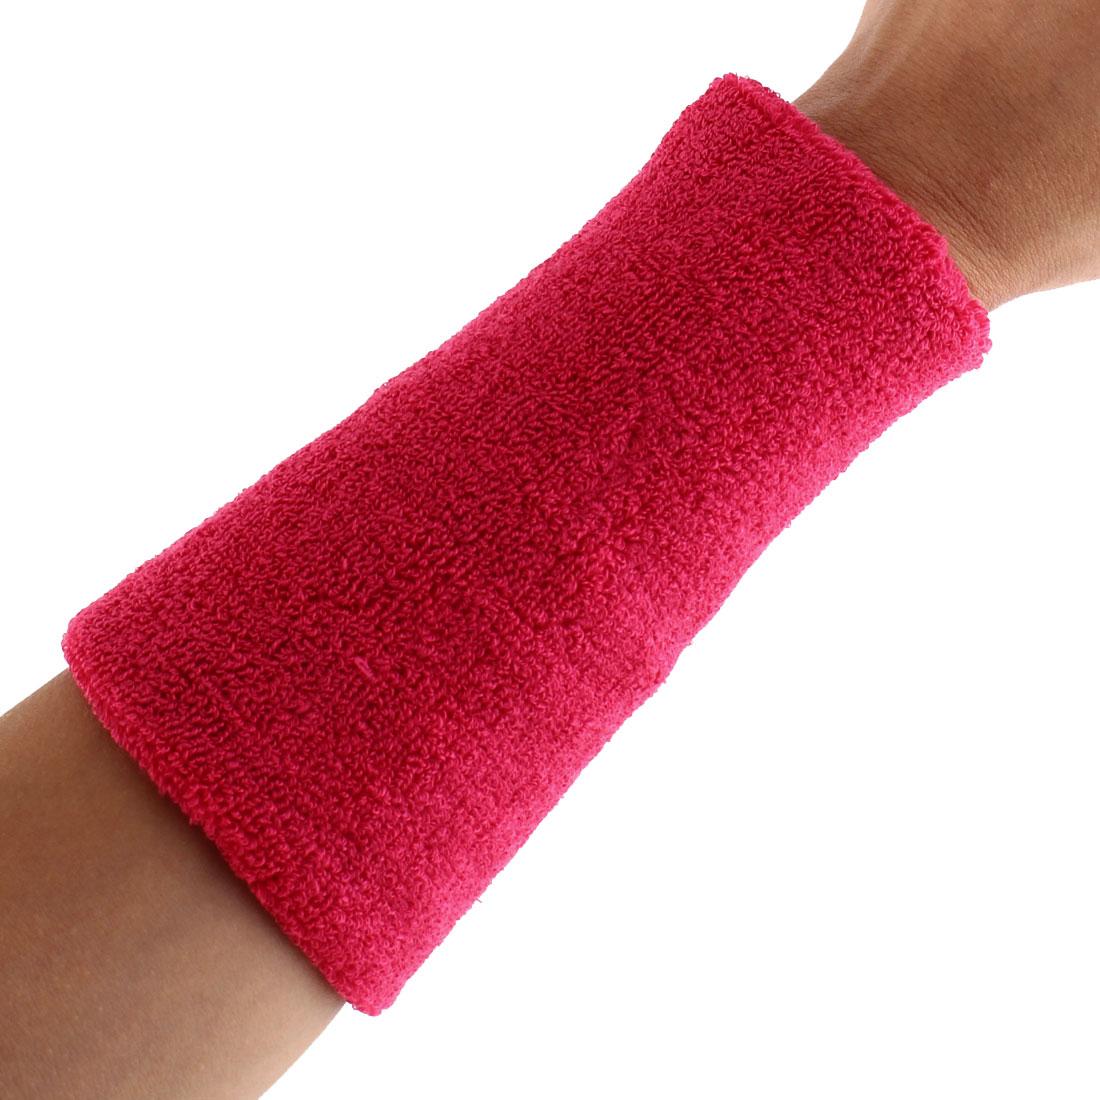 Exercises Basketball Running Hand Support Bandage Sweatband Wristband Sport Wrist Fuchsia 15cm Long 2pcs